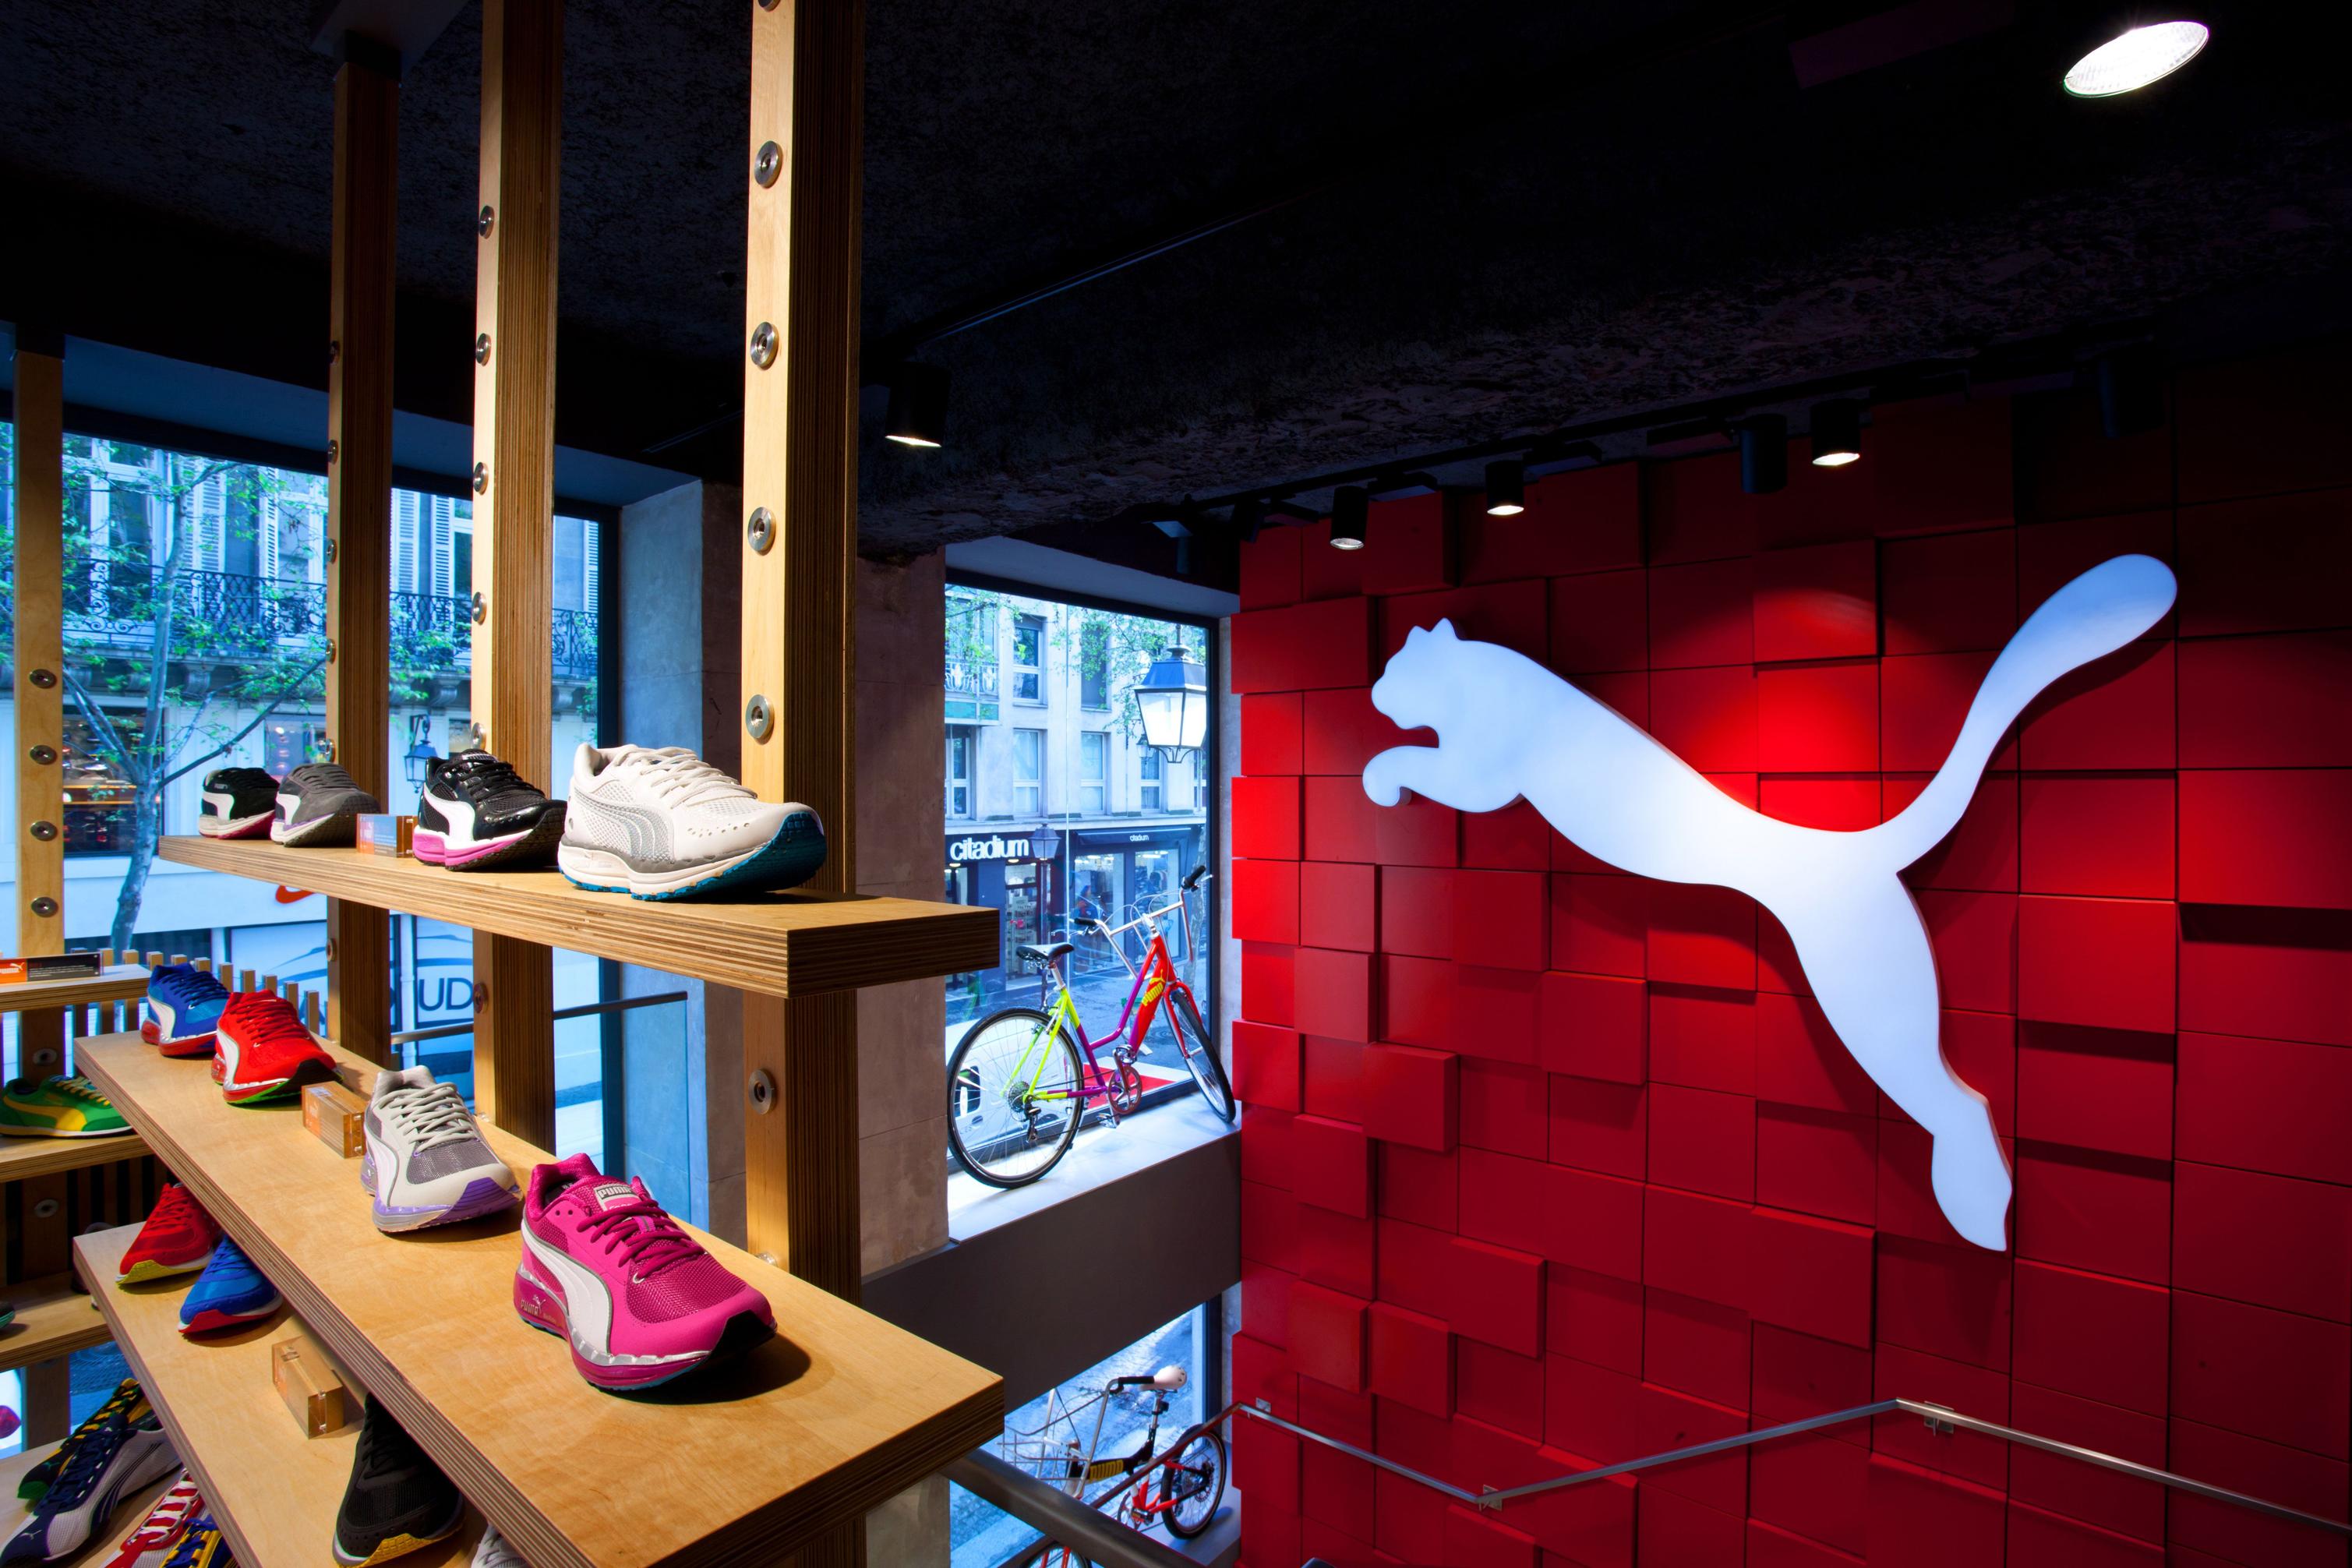 Fashion-дайджест  половина выручки Puma за логотип и захват Asya  Malbershtein - New Retail 9f4877fdc7f